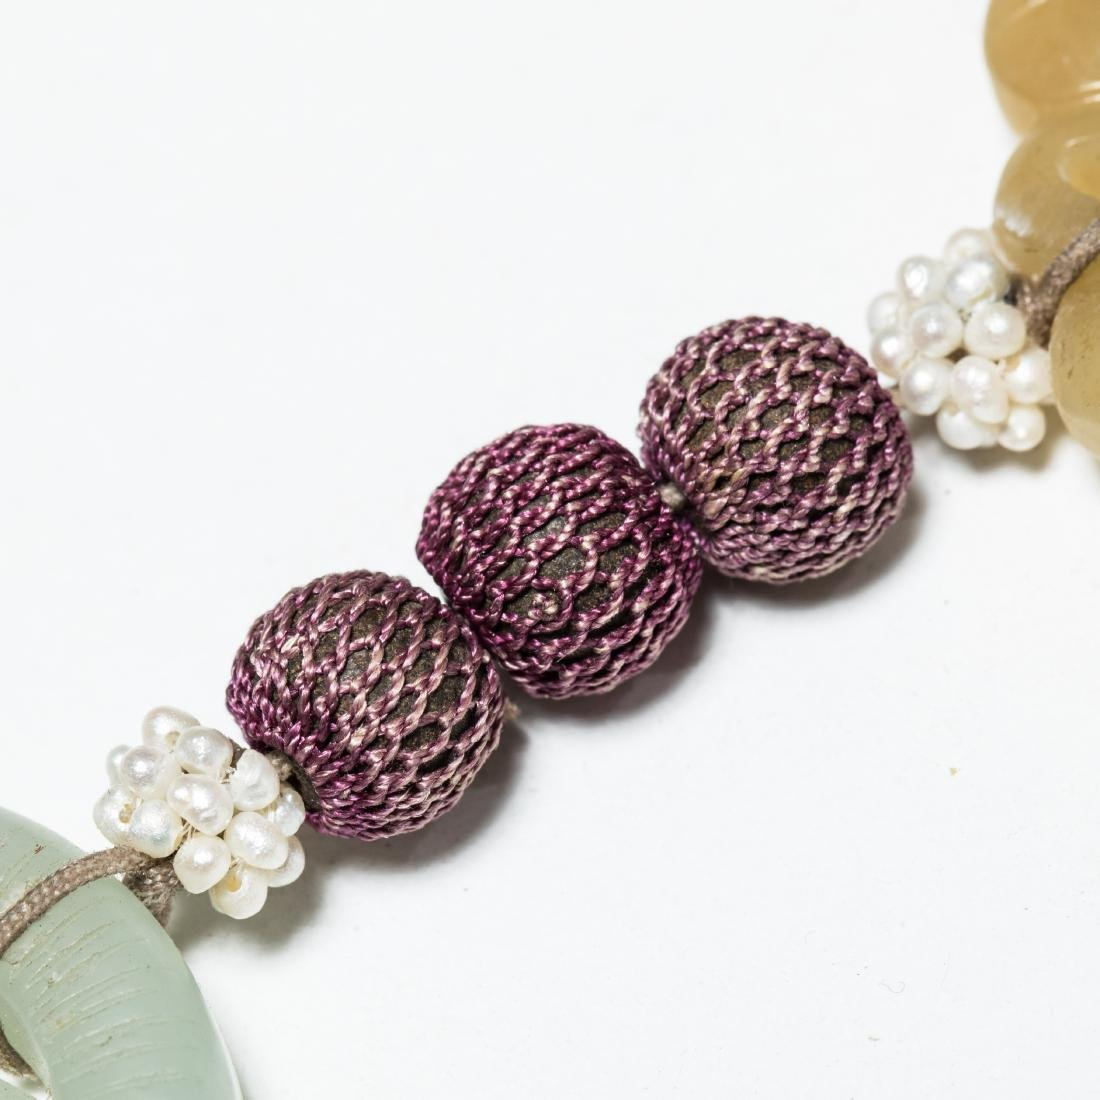 19th Manchu Style Antique Jade Pendant - 8